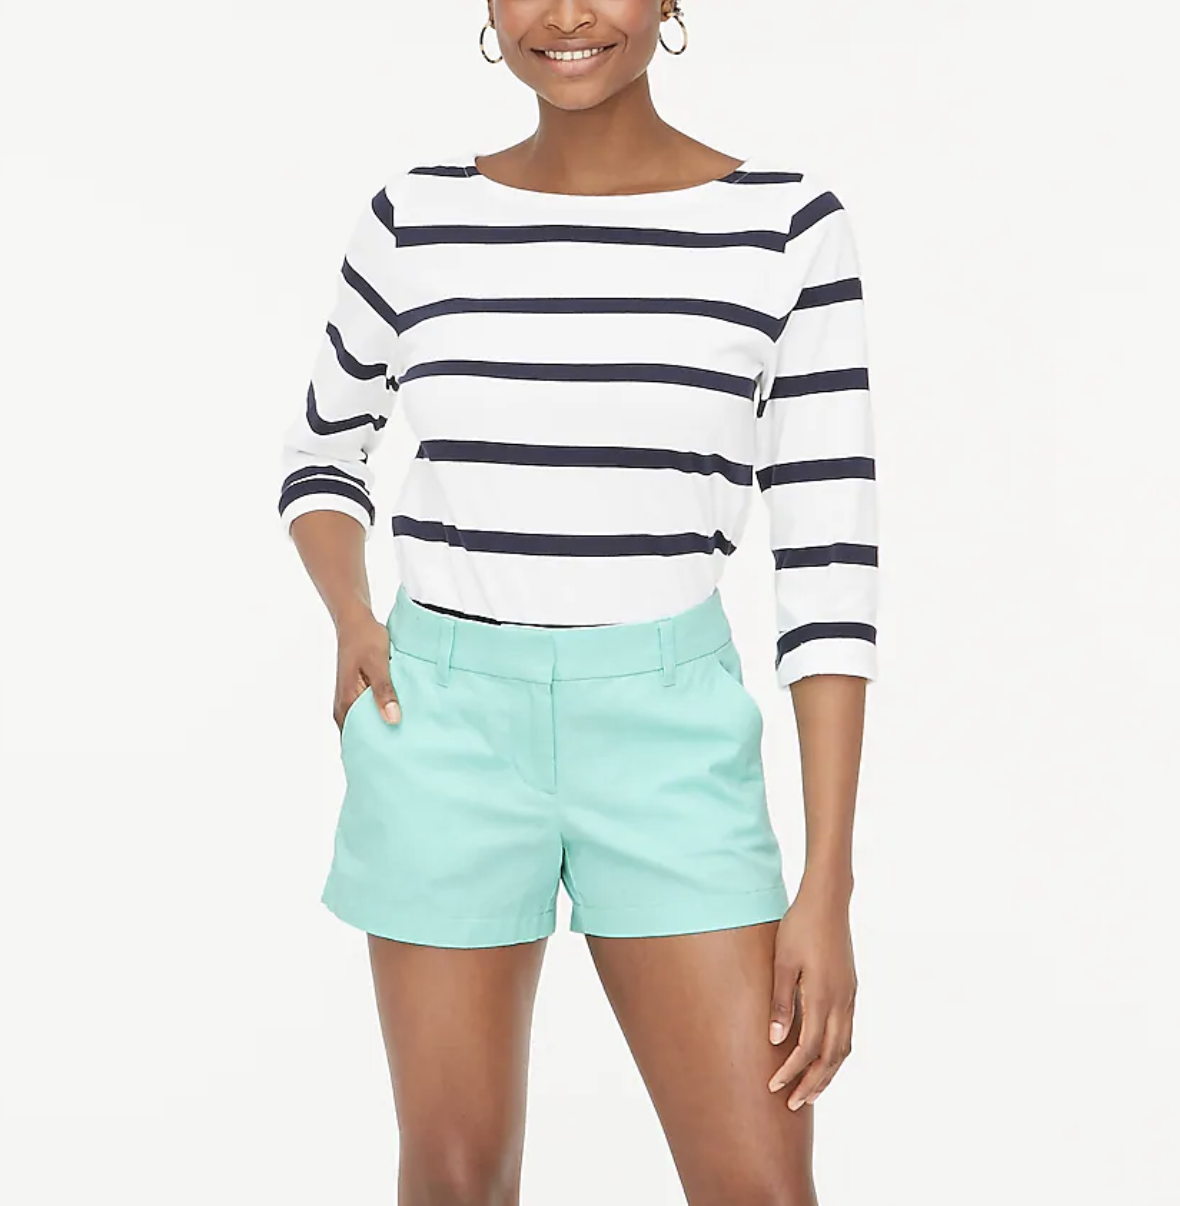 A model wears aqua classic chino shorts